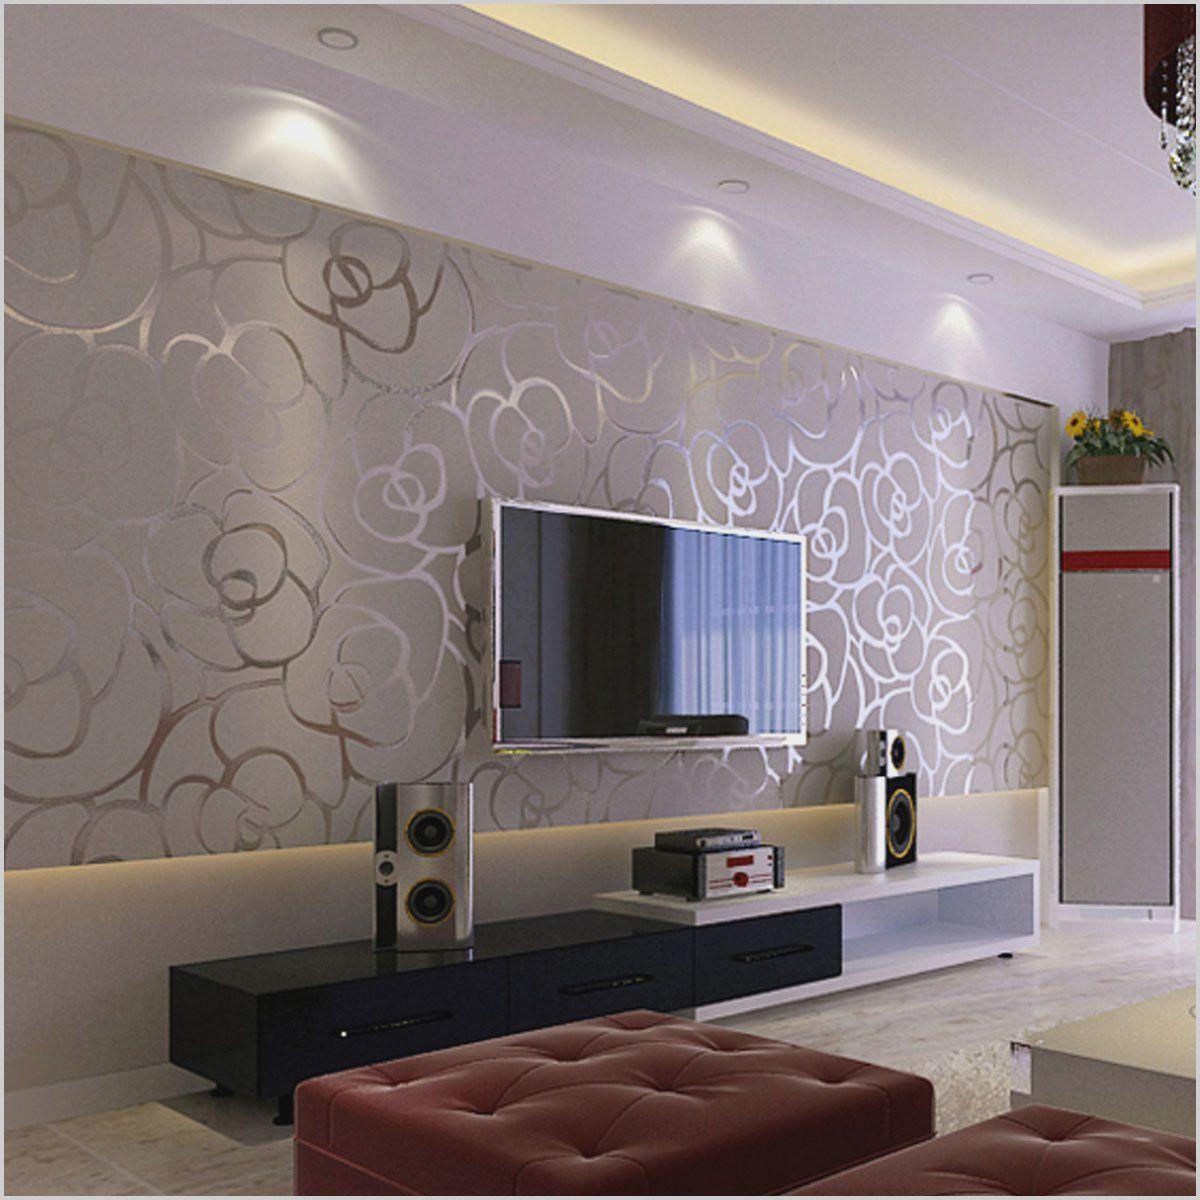 Wallpaper Designs For Living Room Mumbai Living Room Modern Wall Decor Living Room Trendy Living Rooms